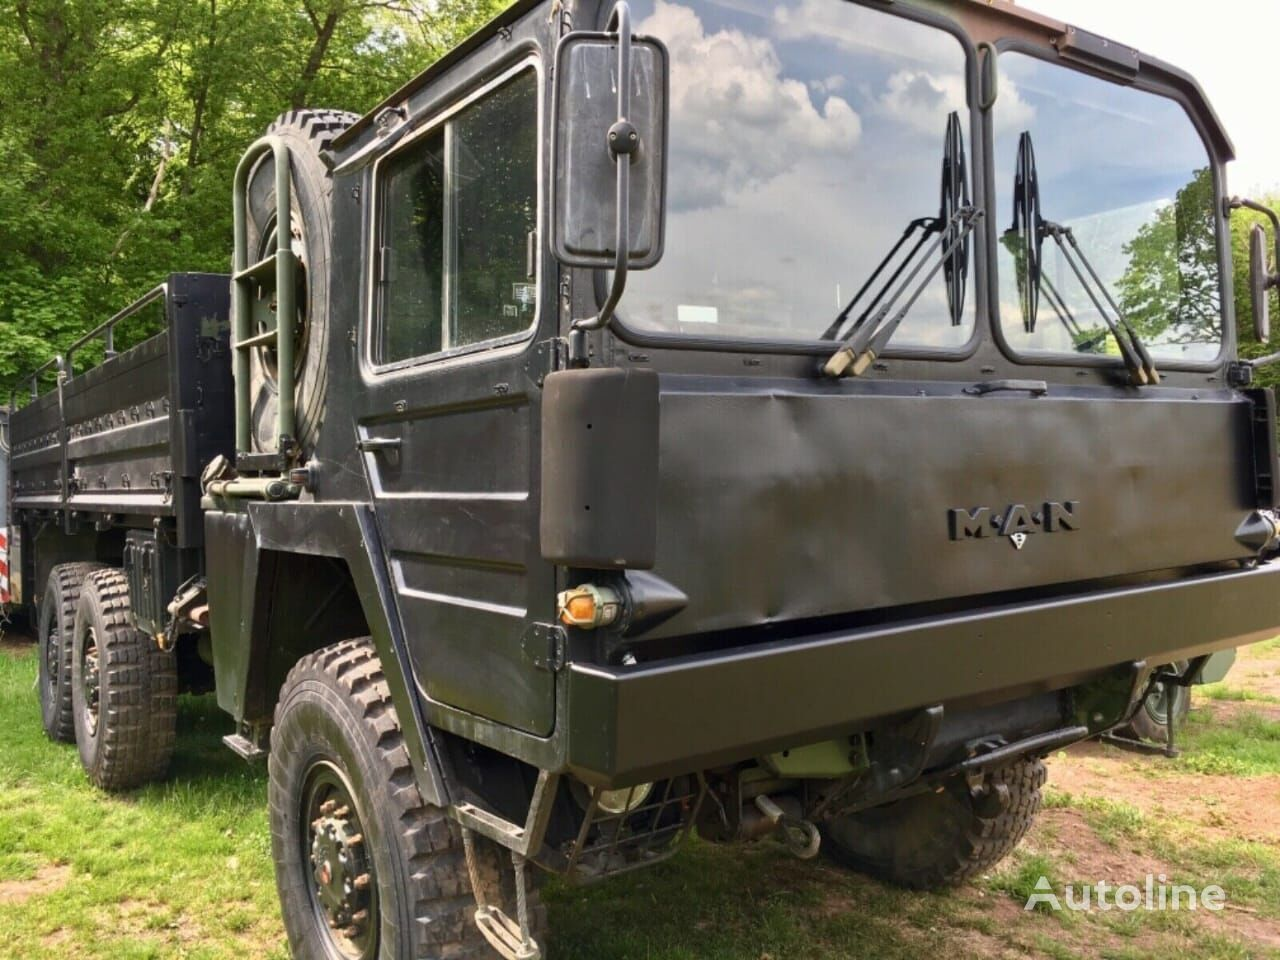 MAN KAT1 6x6 FLAT BED TRUCK (LHD) flatbed truck